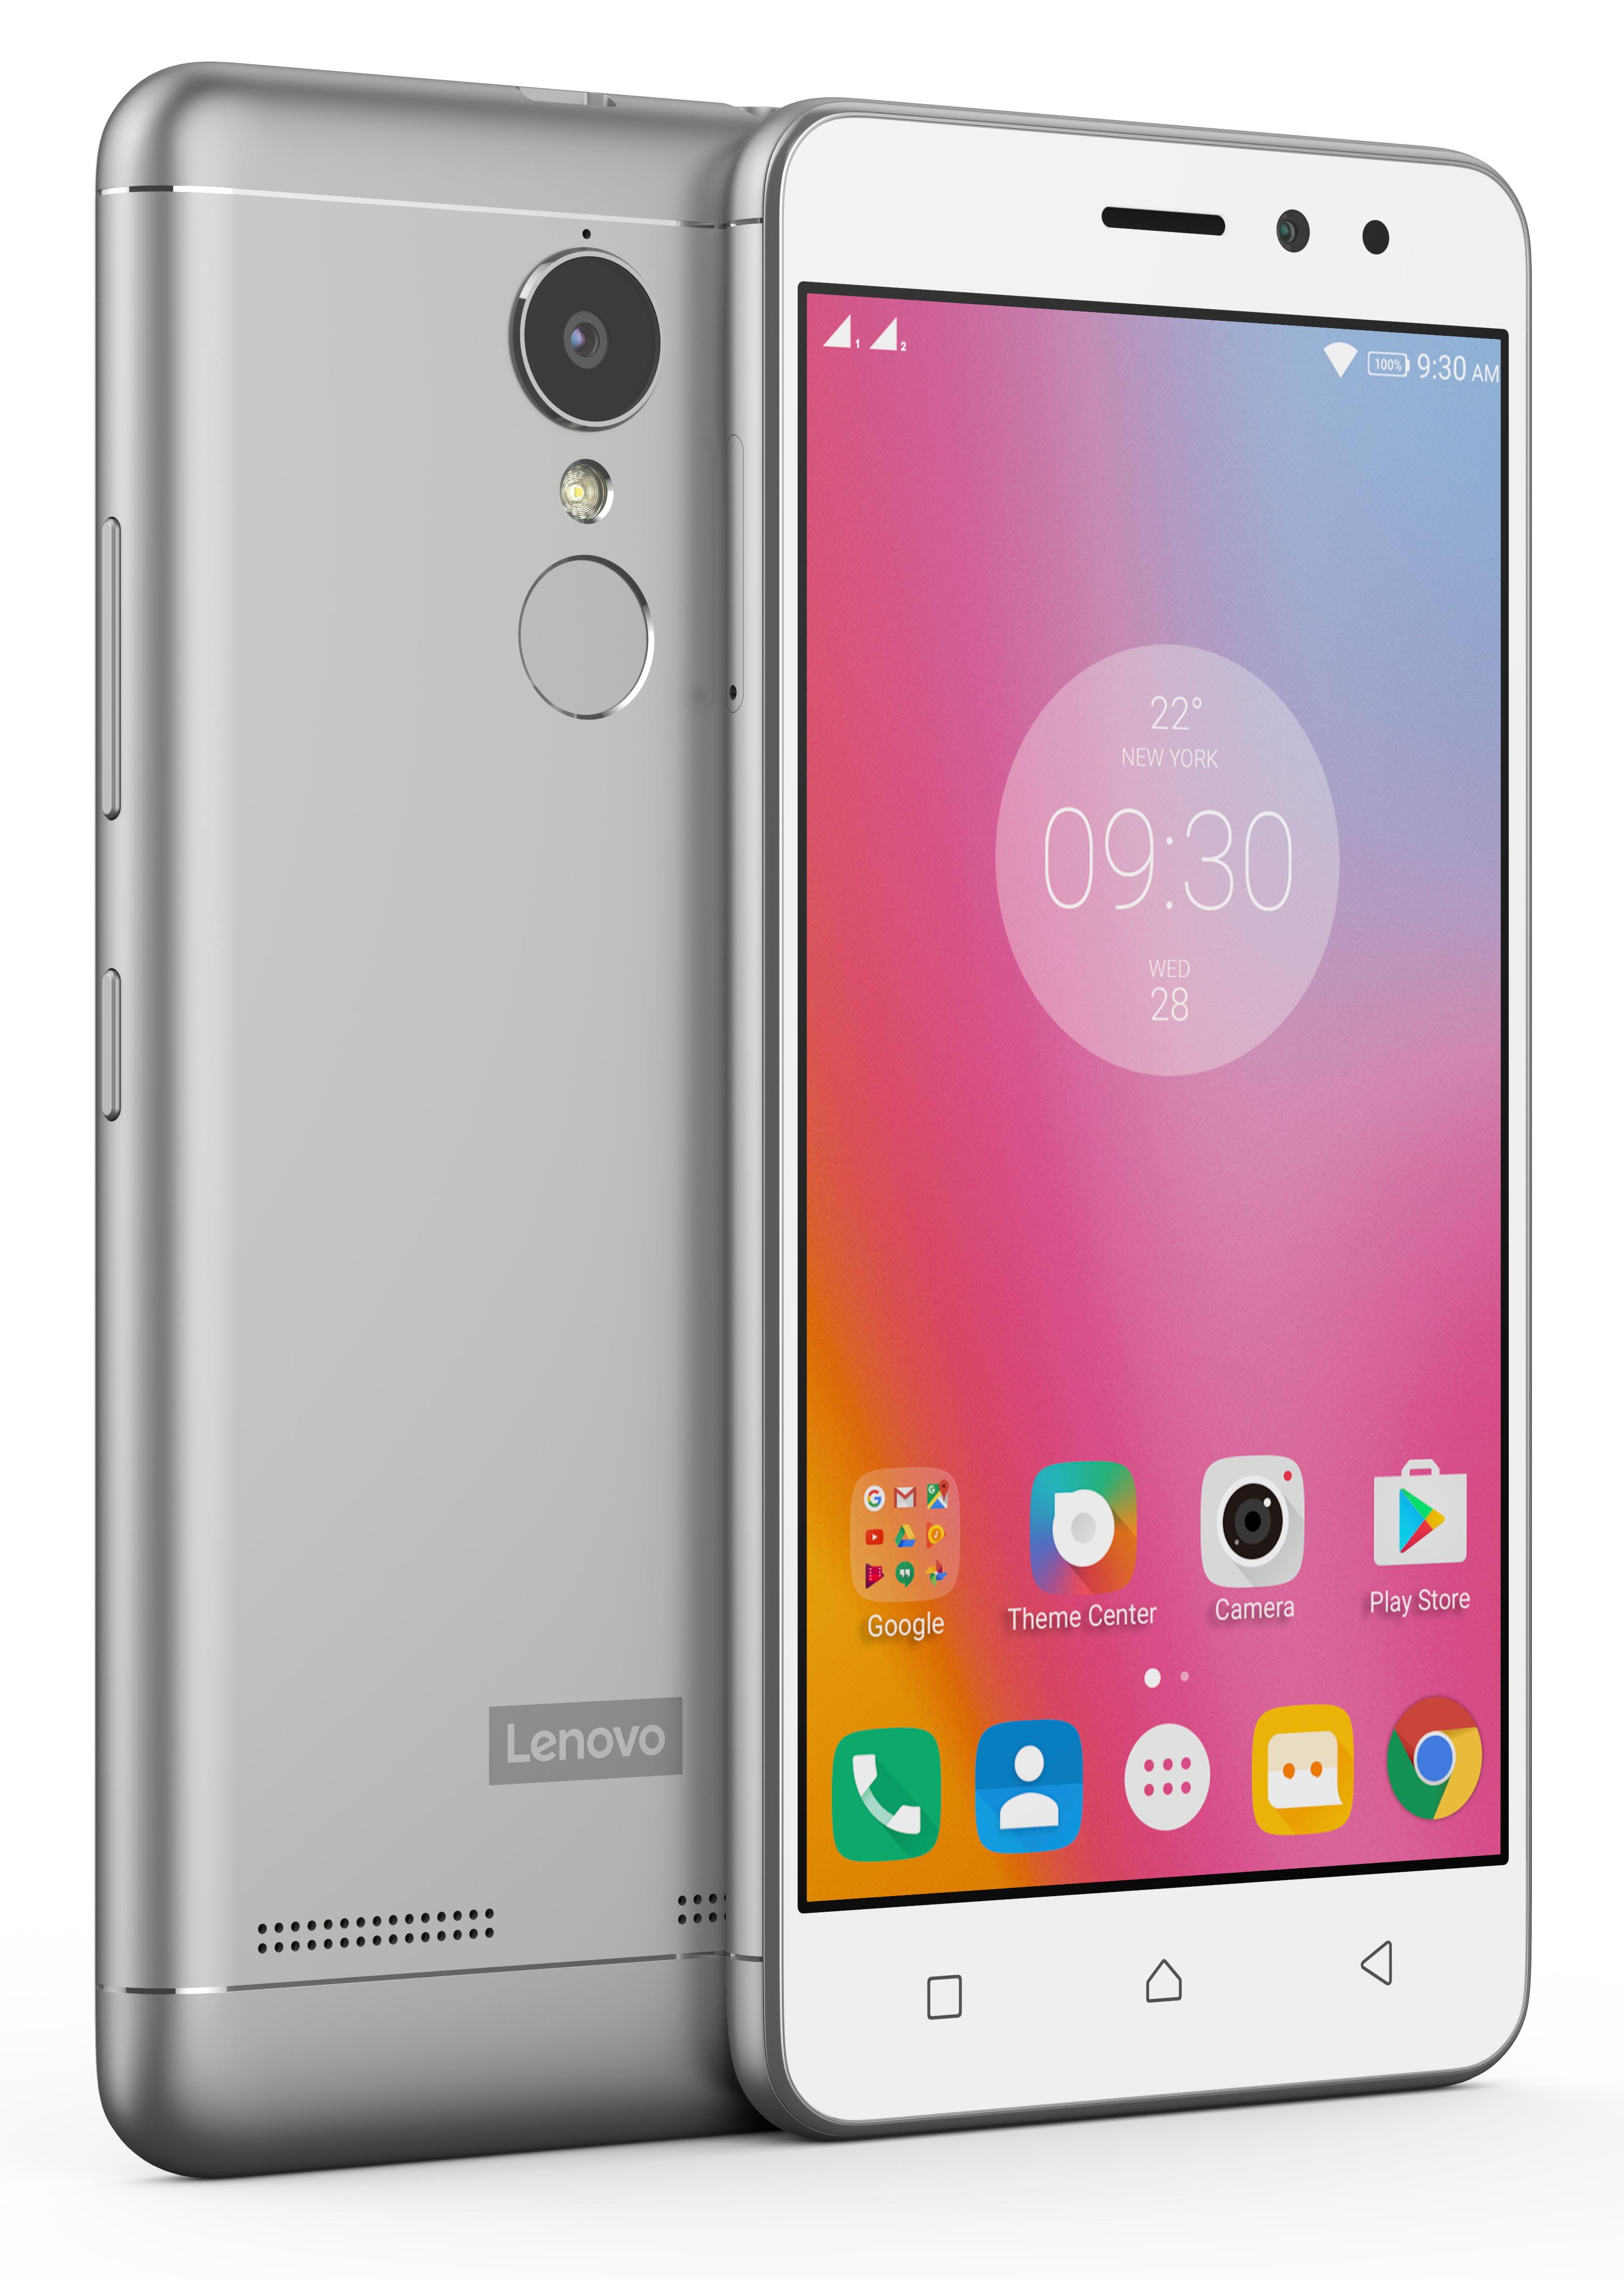 Test Lenovo K6 Smartphone - Notebookcheck.com Tests